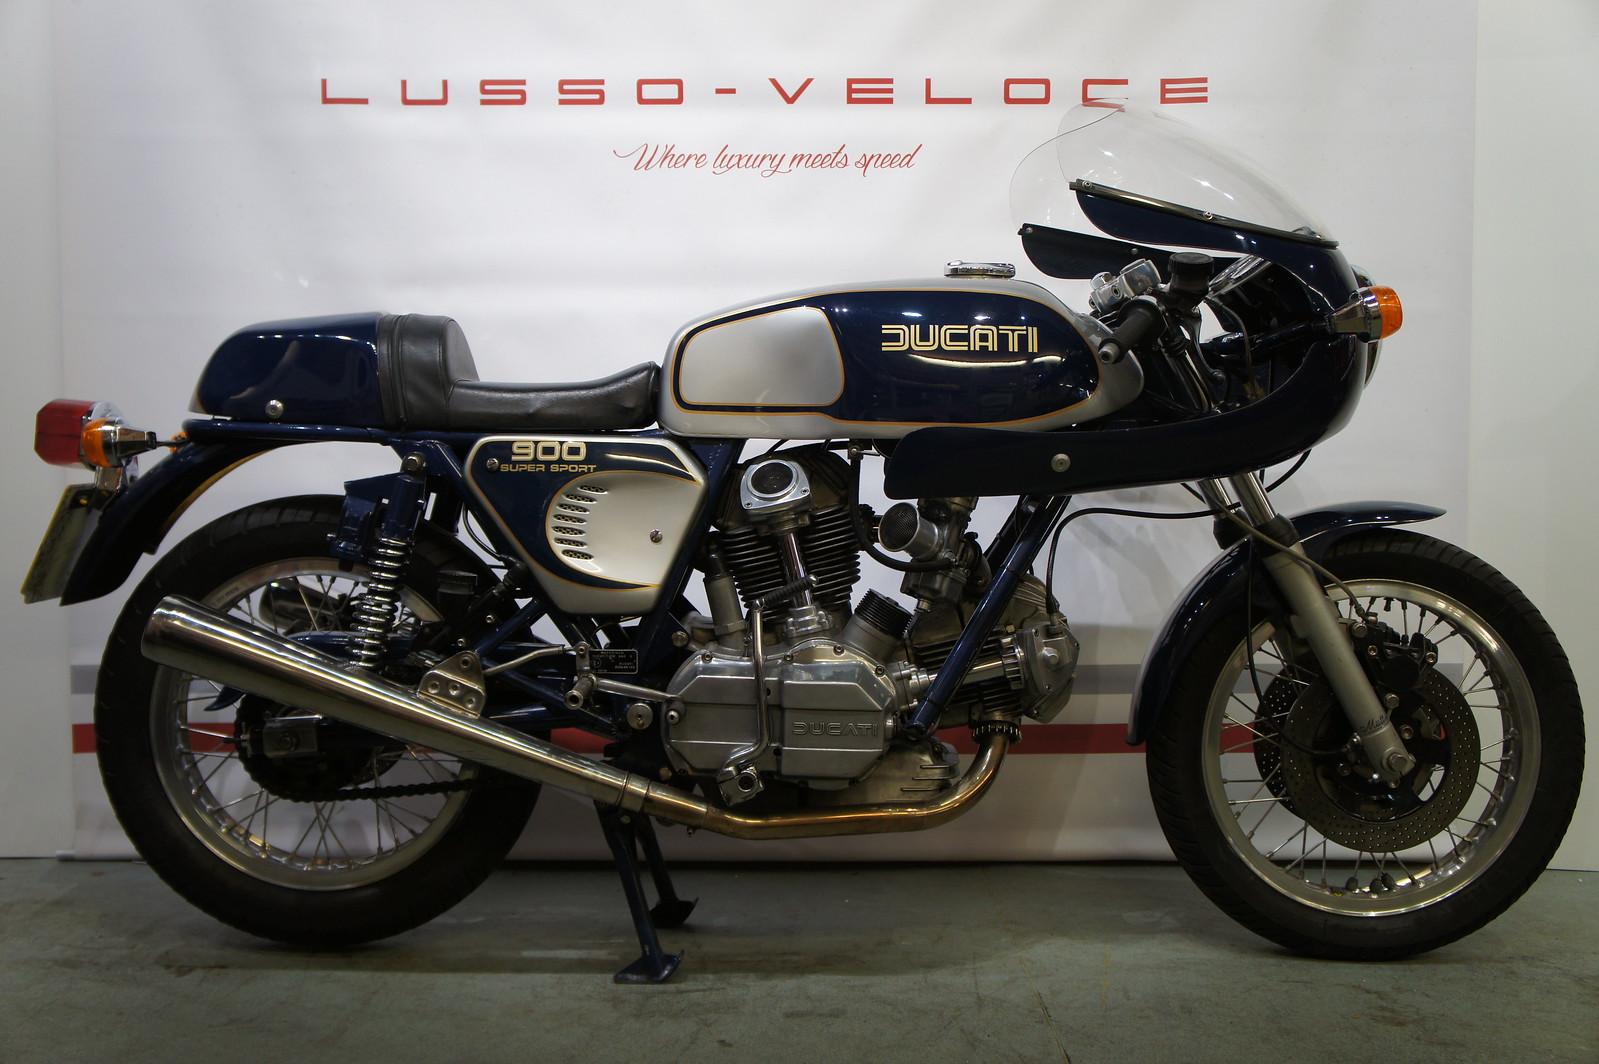 Ducati 900 SS Bevel